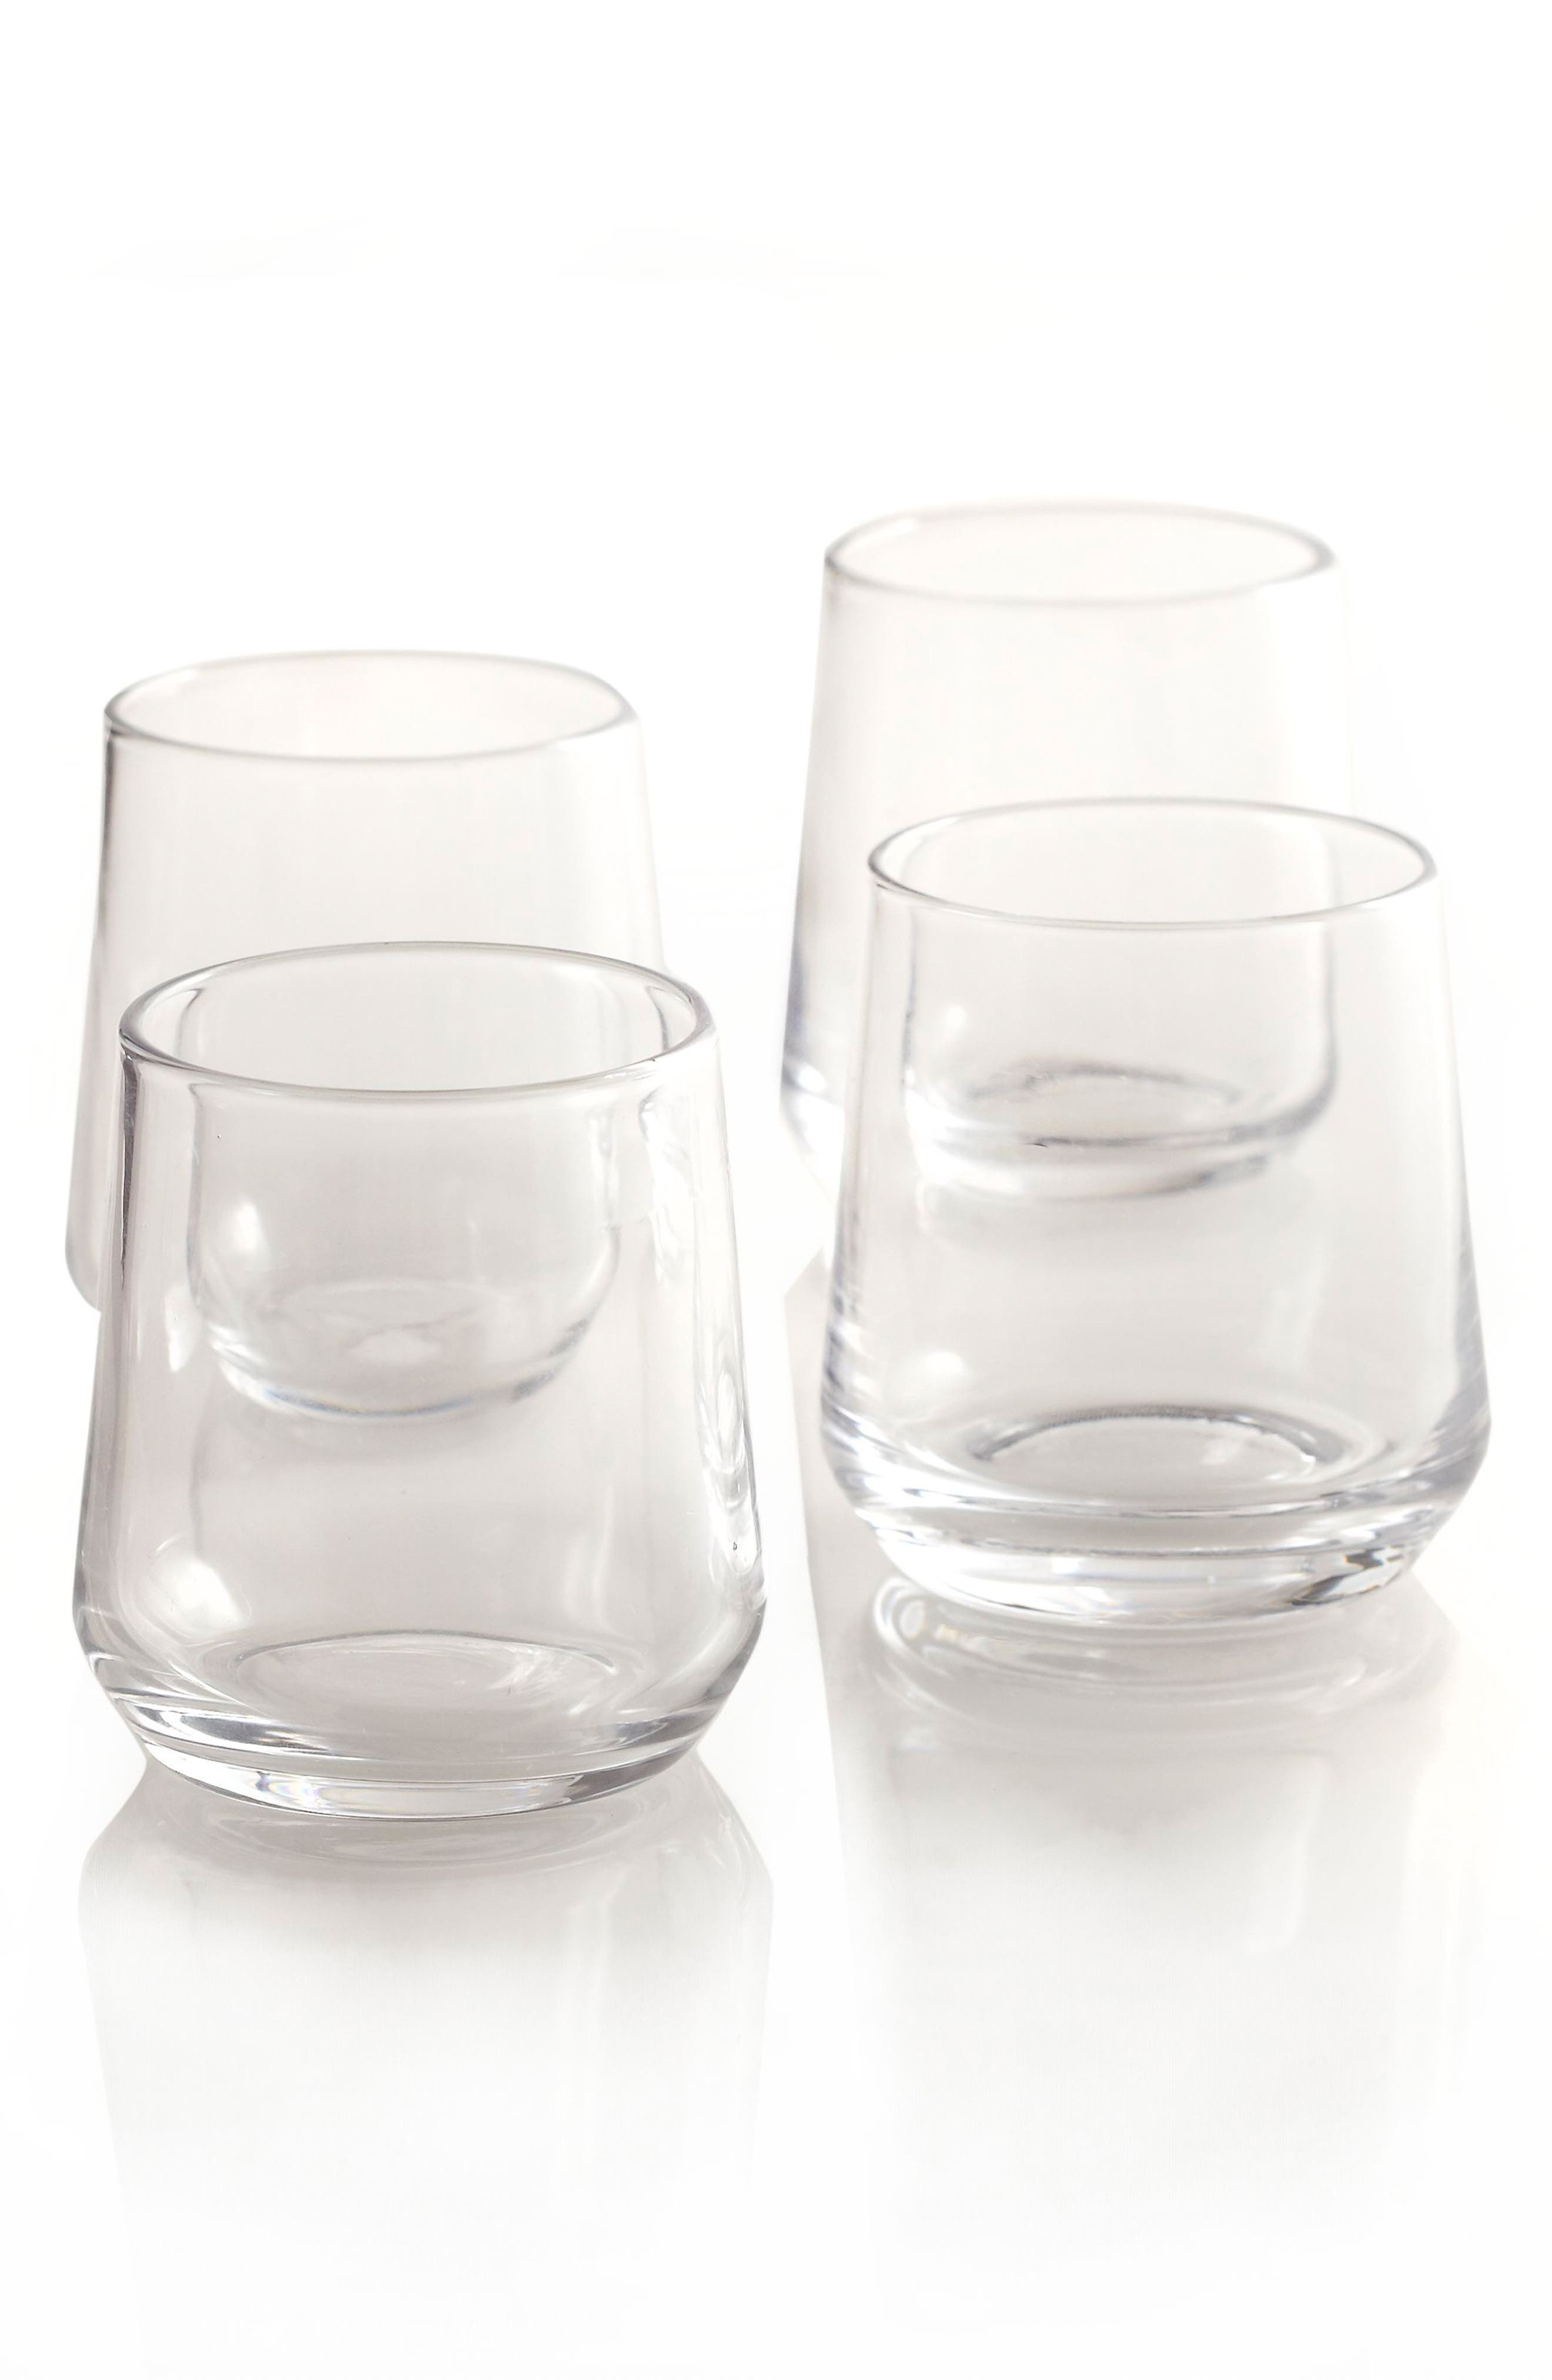 Set of 12 Tasting Glasses,                         Main,                         color, 100